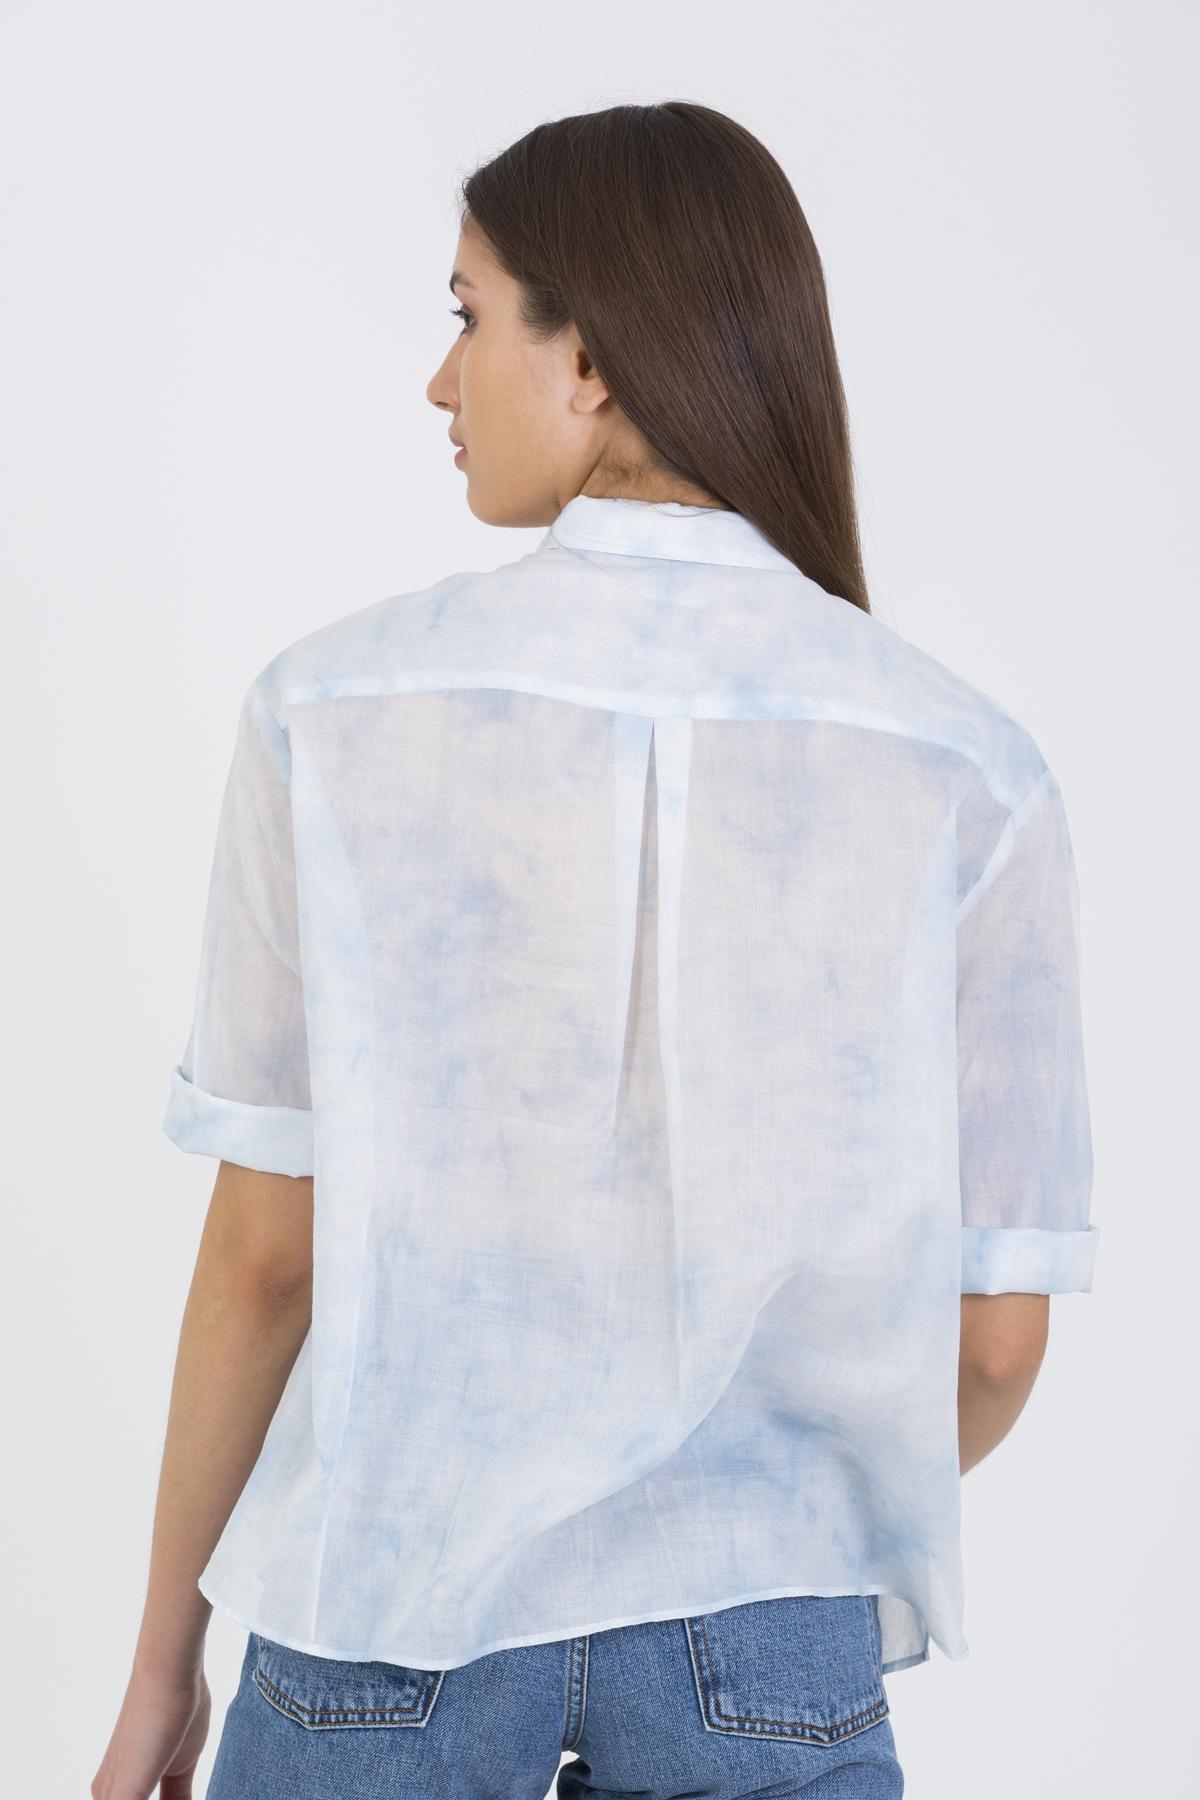 simone-tied-dye-cotton-shirt-bleu-sacrecoeur-matchboxathens